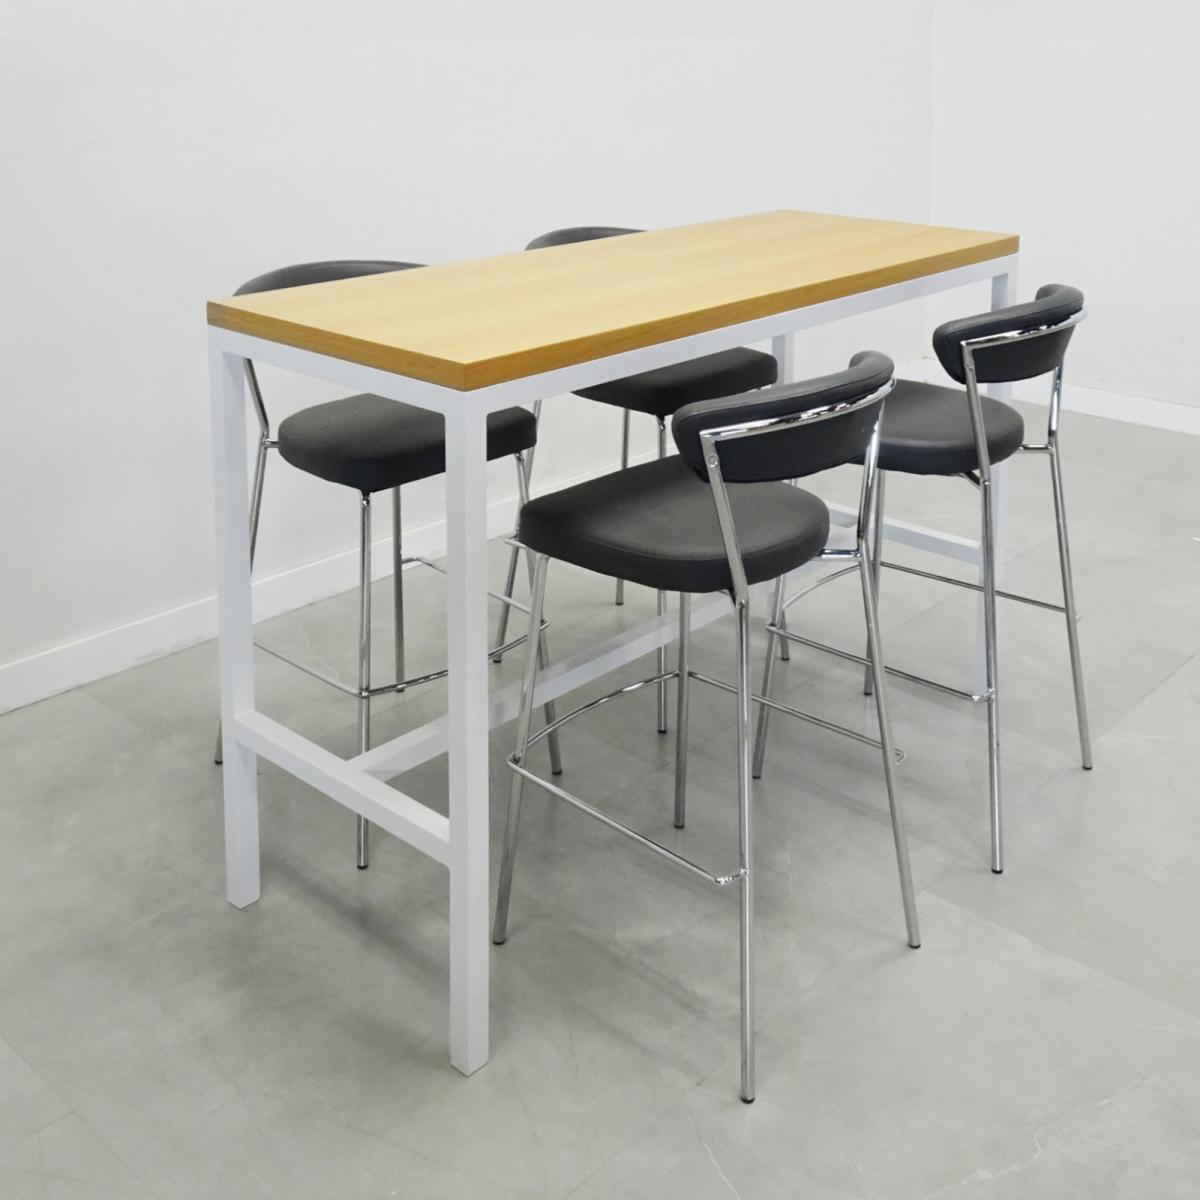 Aspen Bar Table with Laminate & Veneer Tops